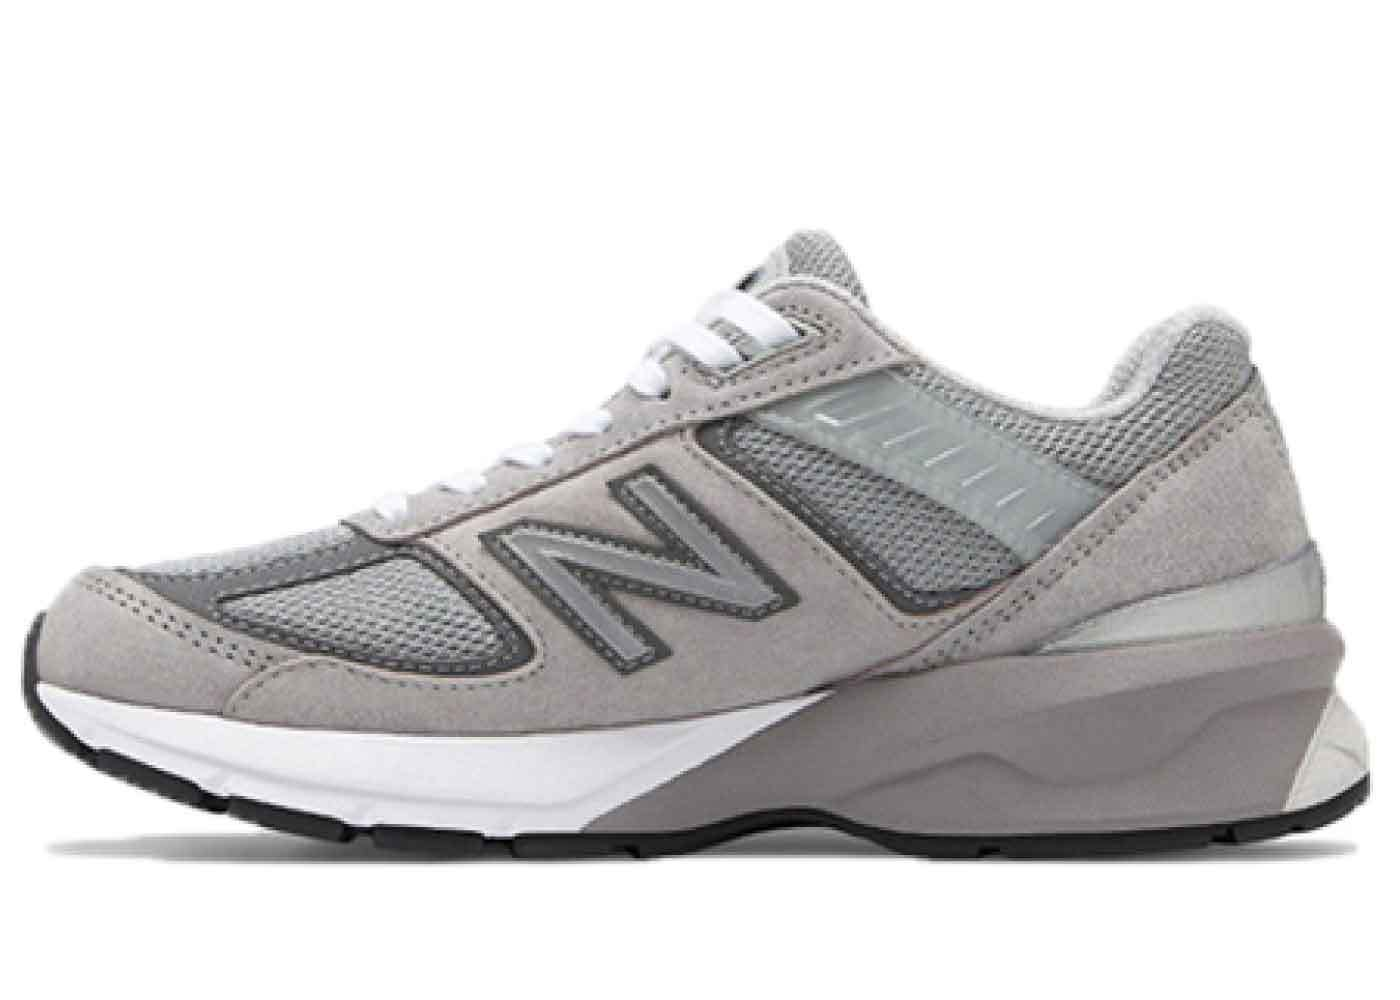 New Balance 990v5 Greyの写真